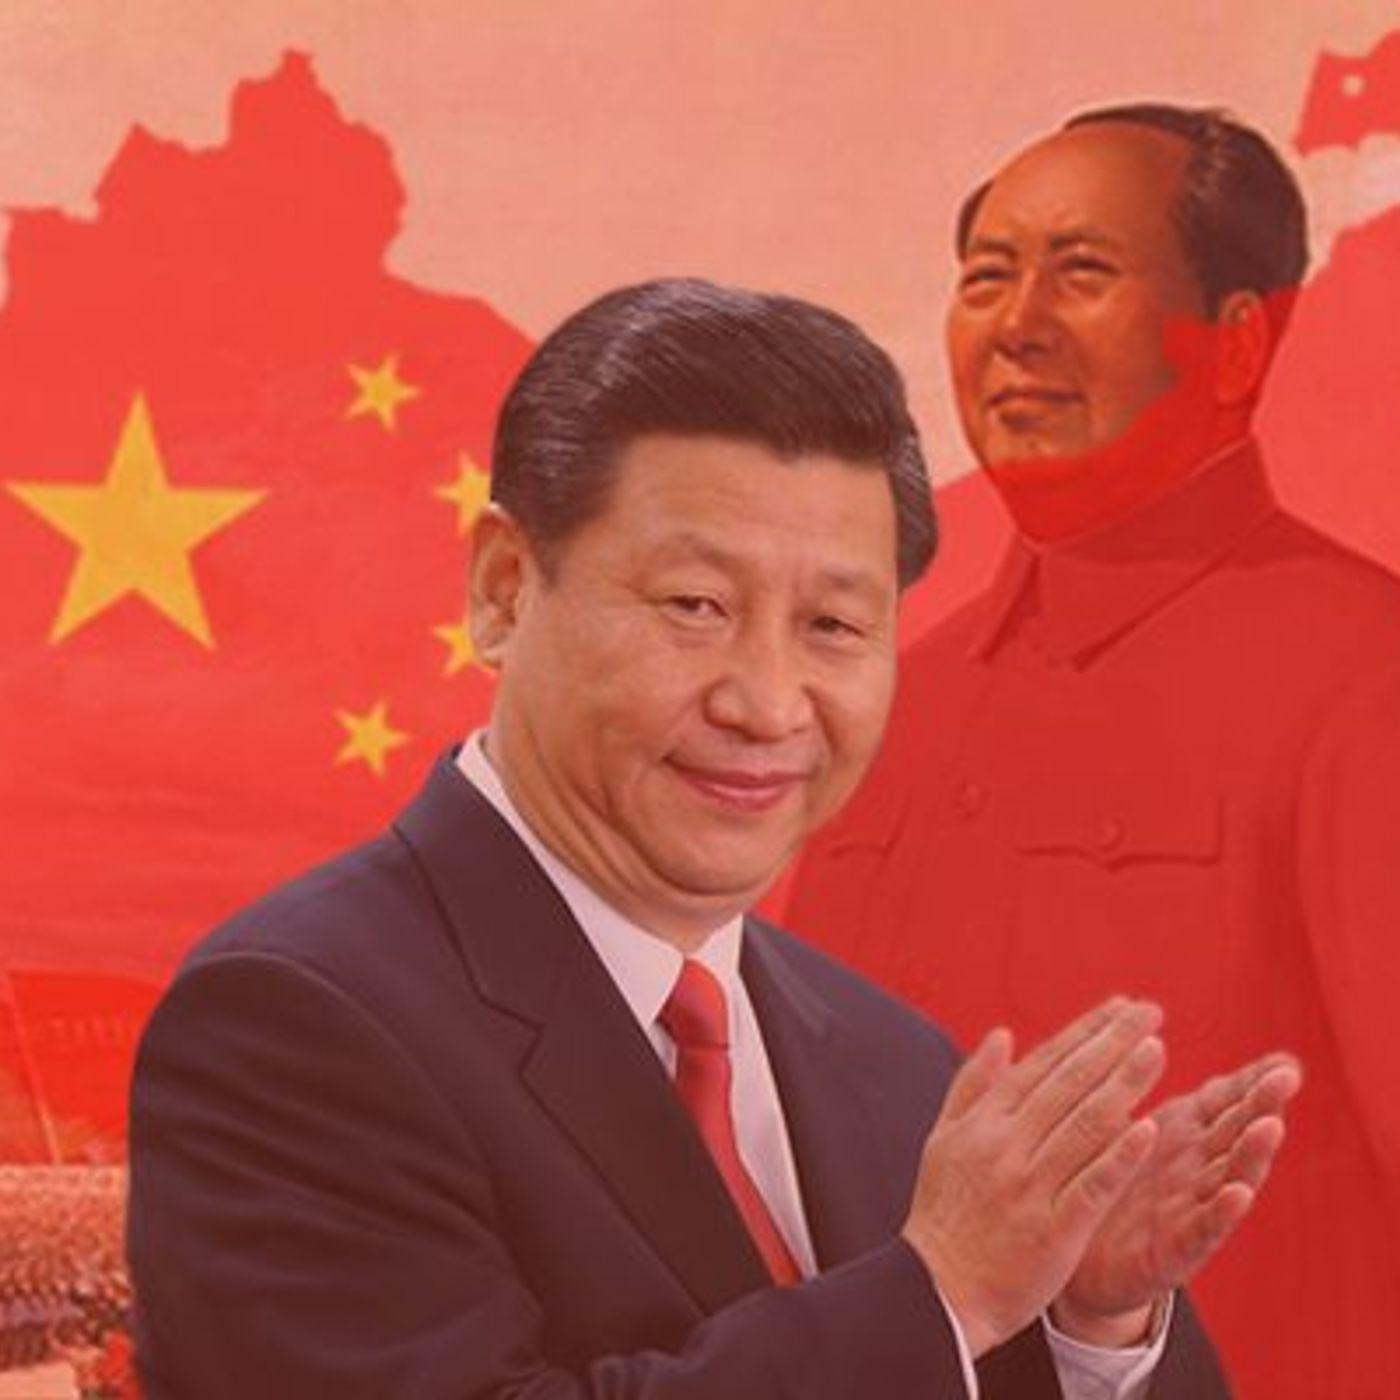 Comrad Xi's Leadership is OVER